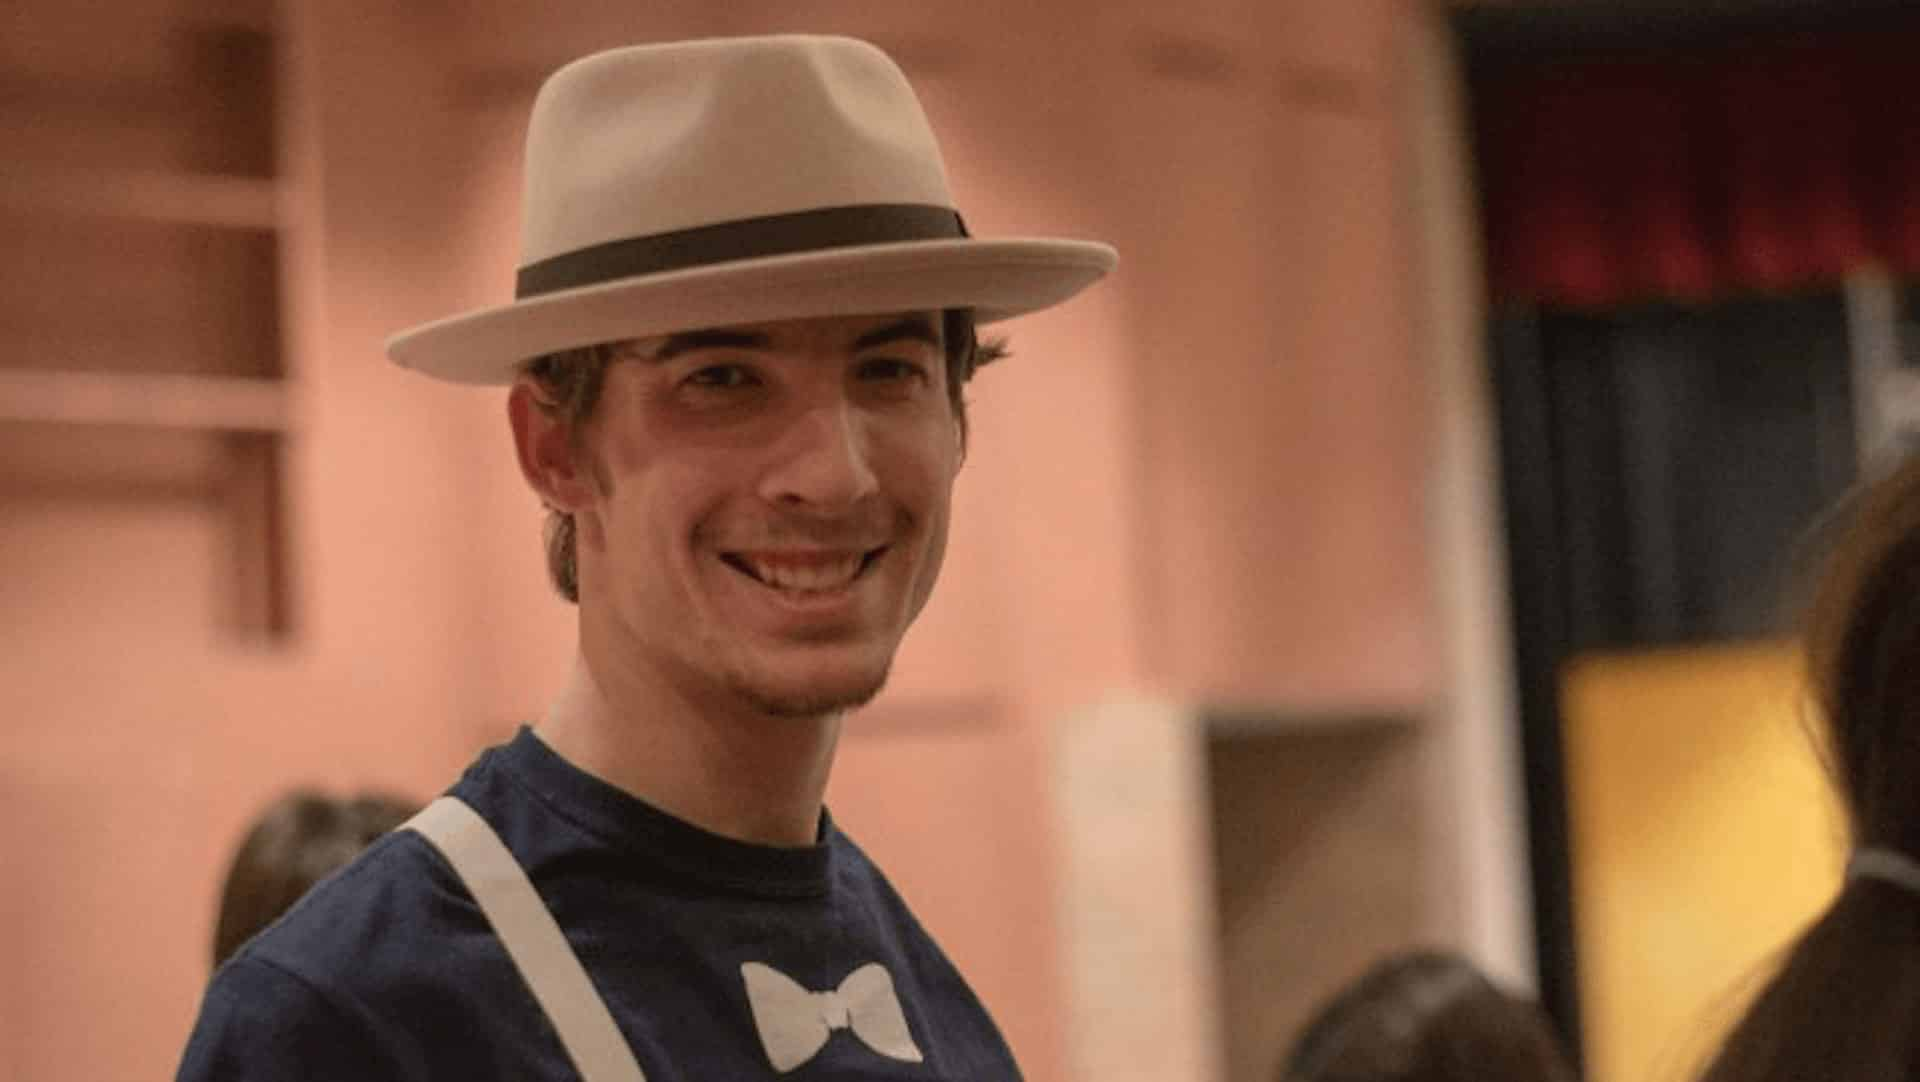 Jonathan Henreckson